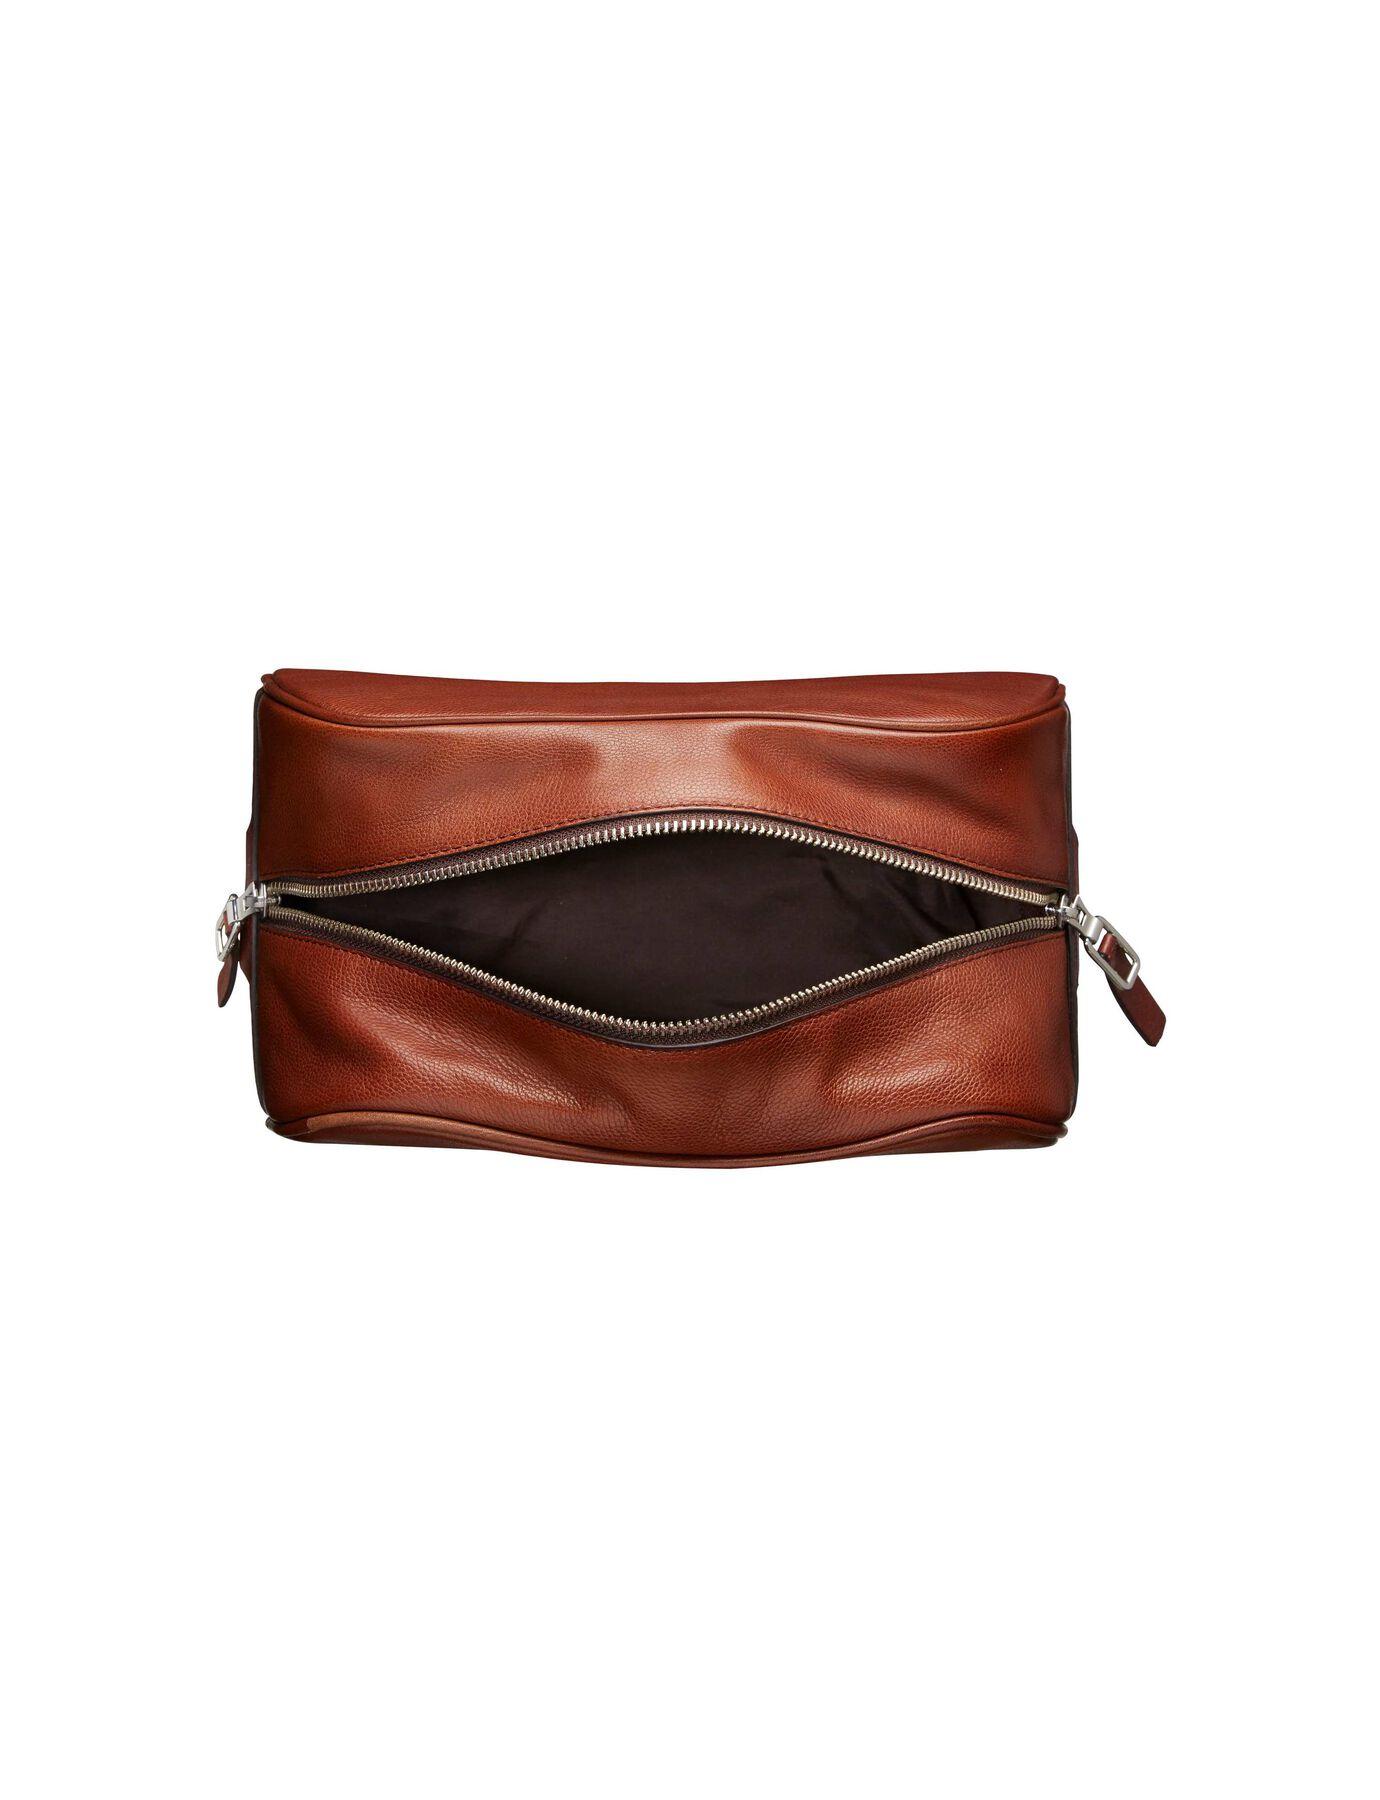 Bonardi toiletry bag in Medium Brown from Tiger of Sweden